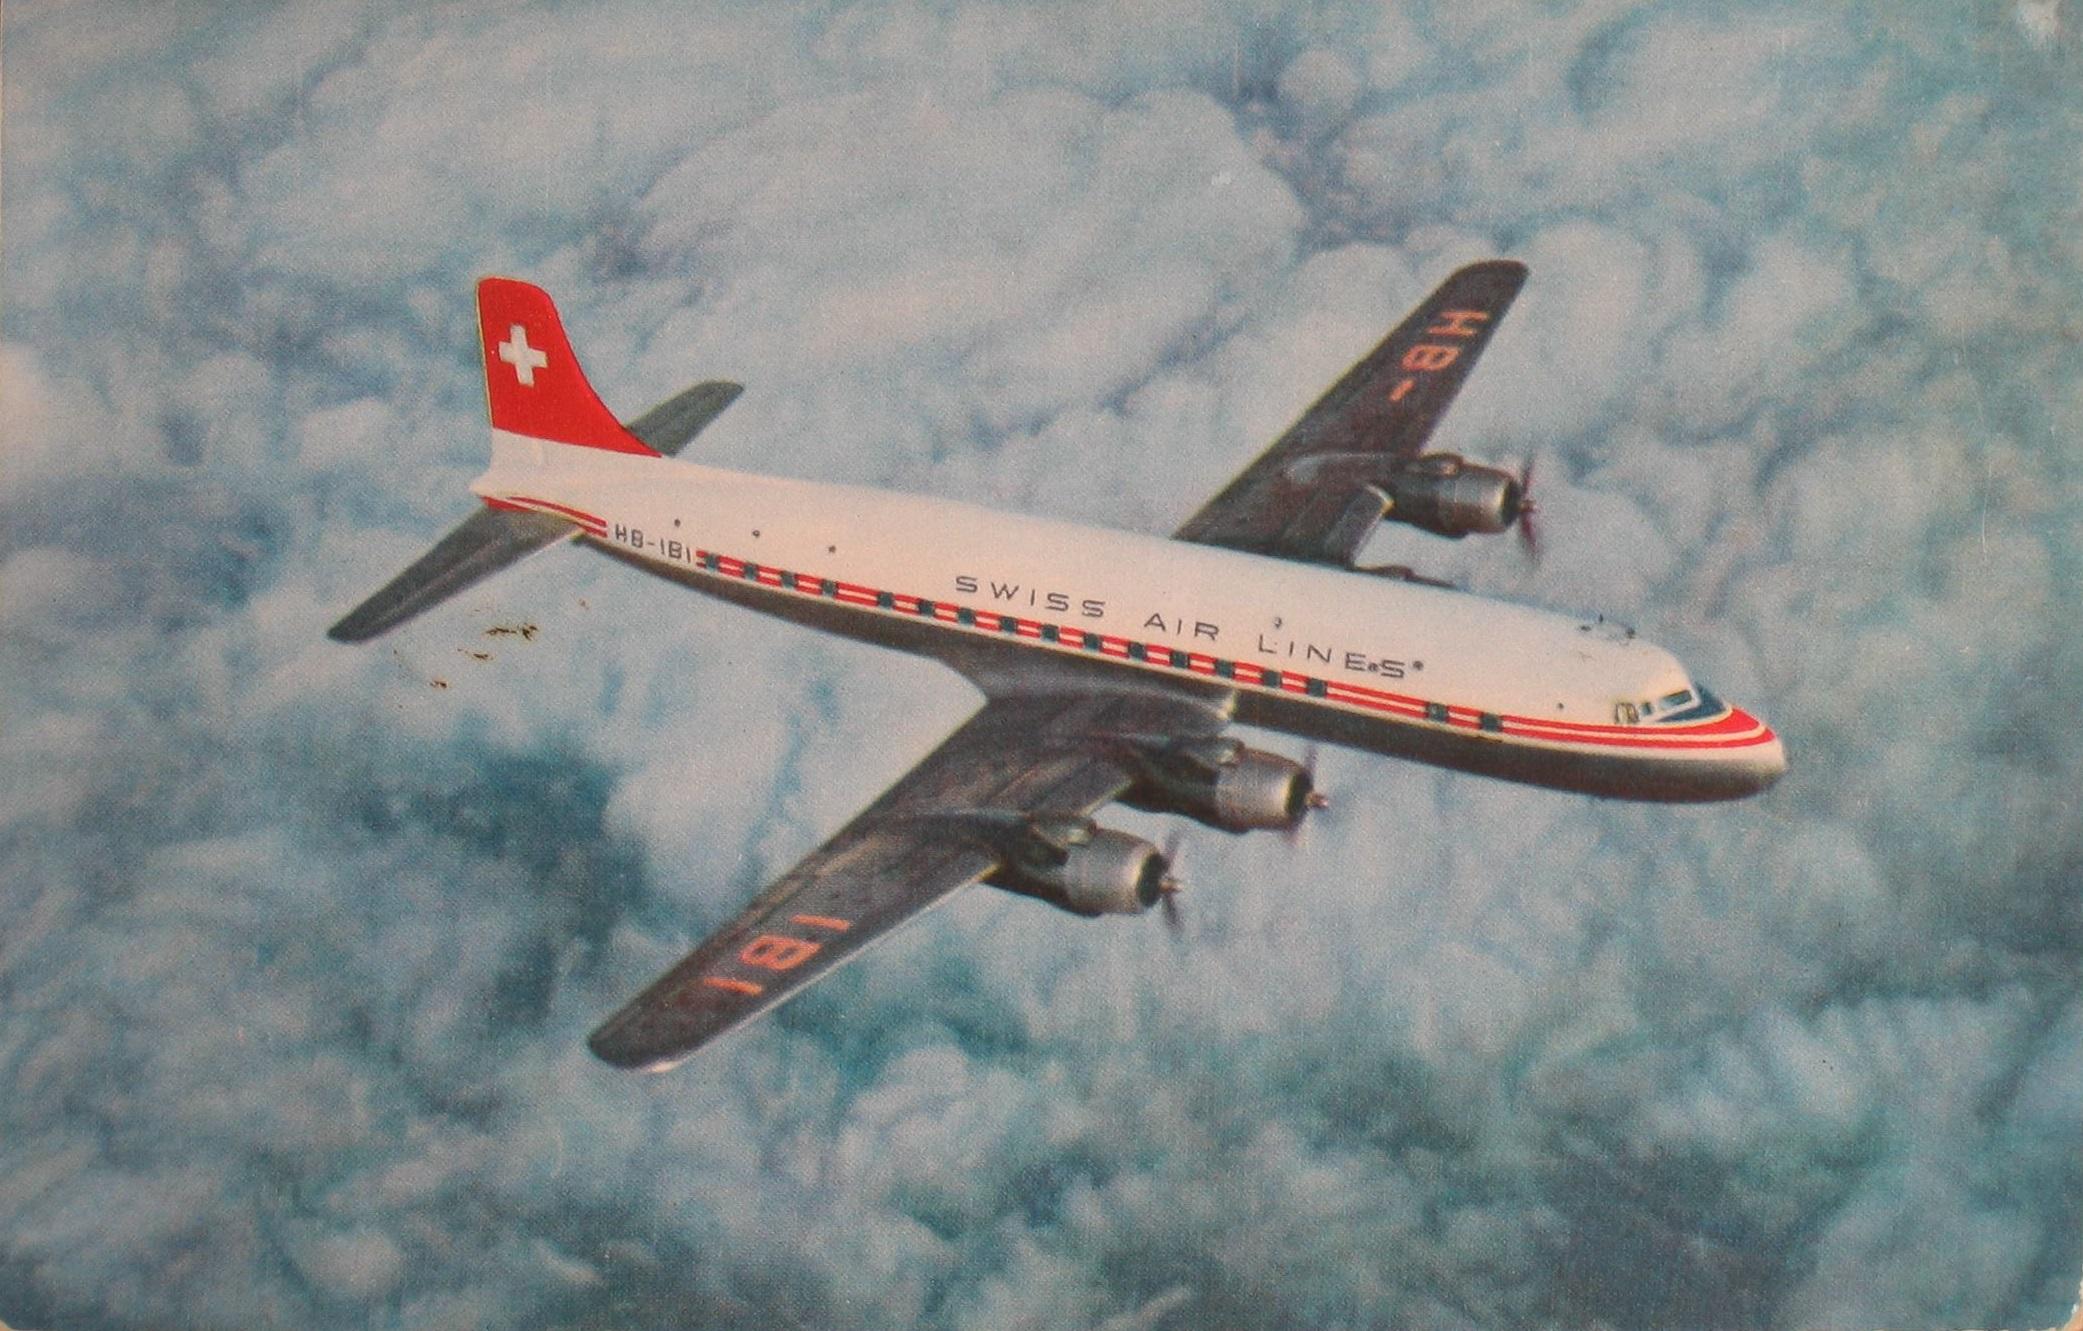 Transantlantic DC-6 B della Swissair. (ETH-Bibliothek Zürich, Archivio fotografico / Fotografo: Swissair Photo AGETH-Bibliothek Zürich, Archivio fotografico / Swissair Photo AG)